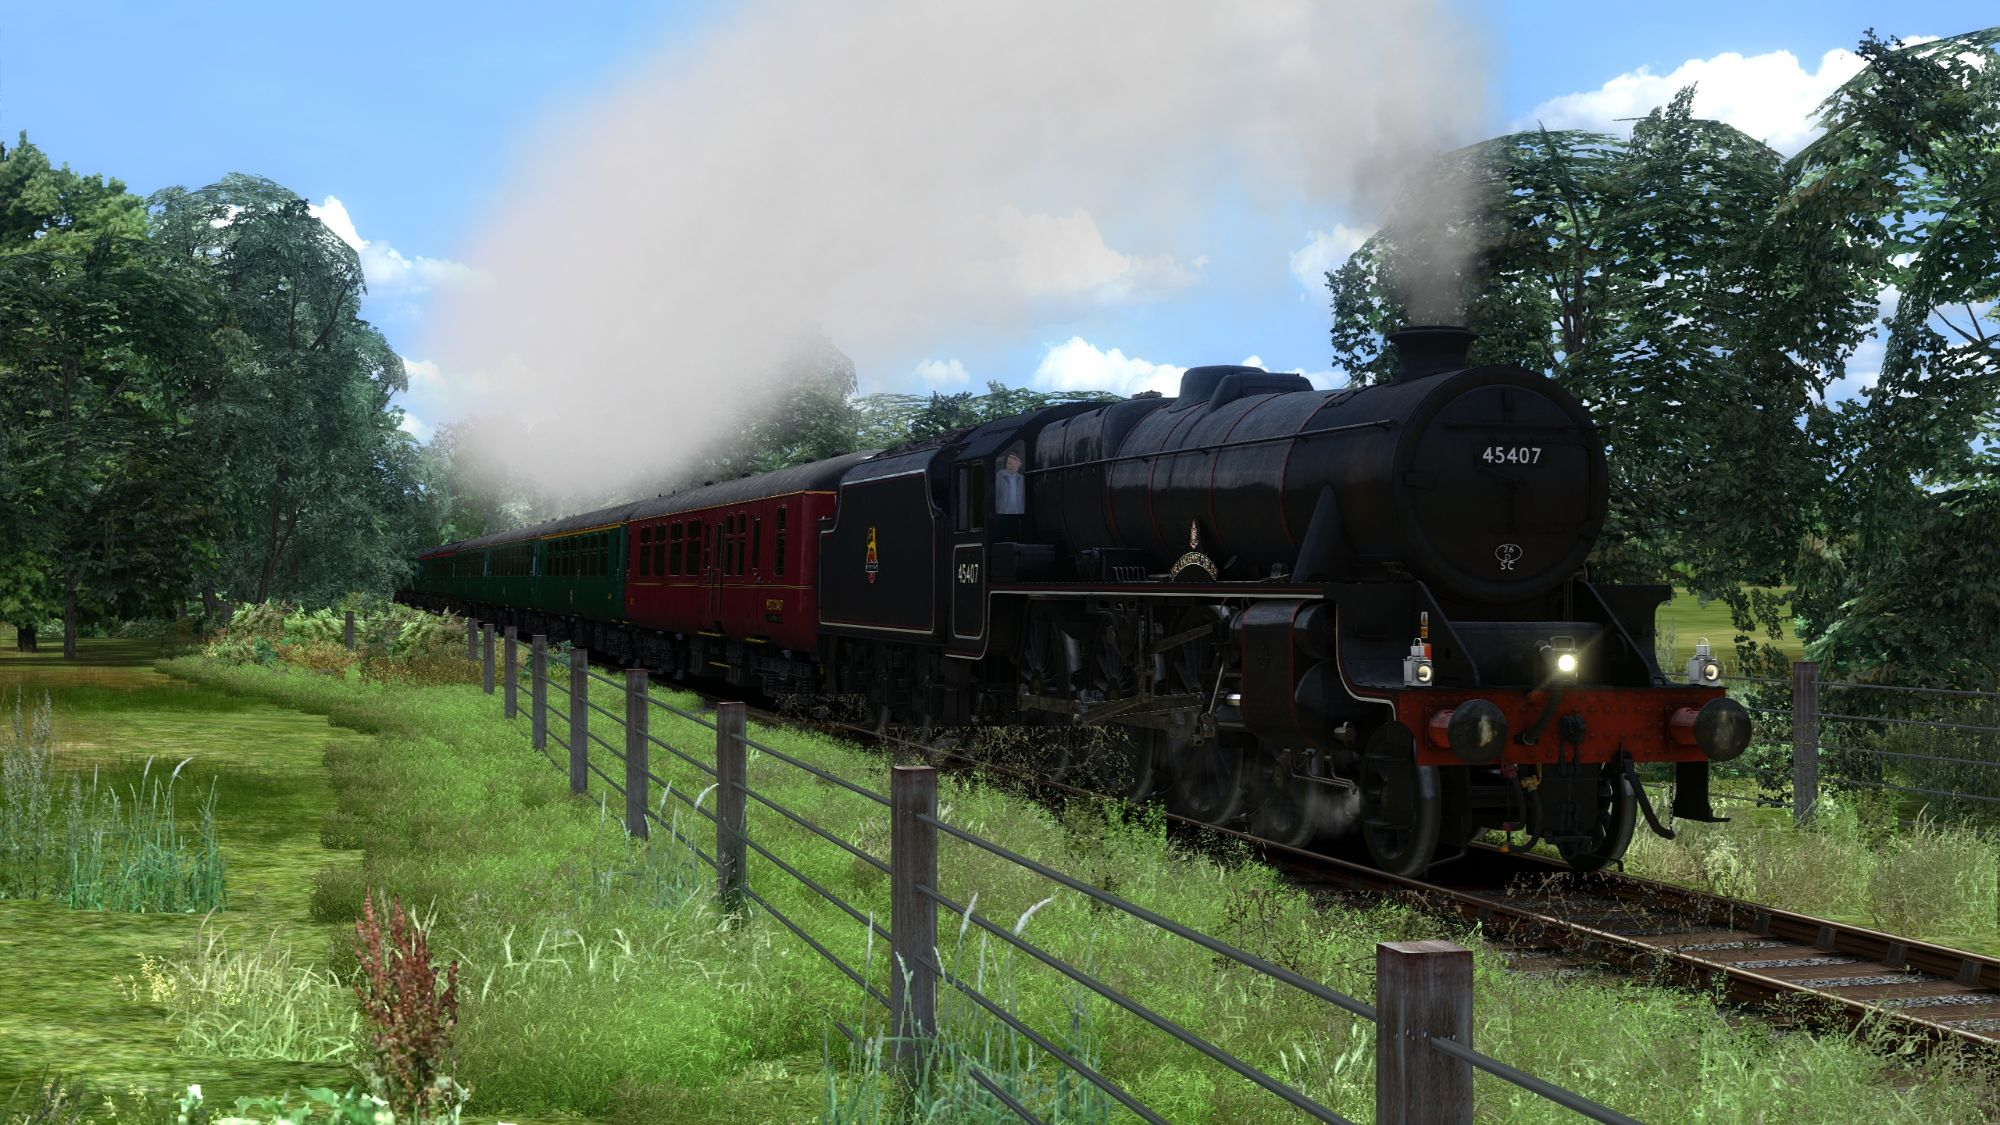 Screenshot_West Somerset Members Edition V4JLW_51.03336--3.16392_12-17-08